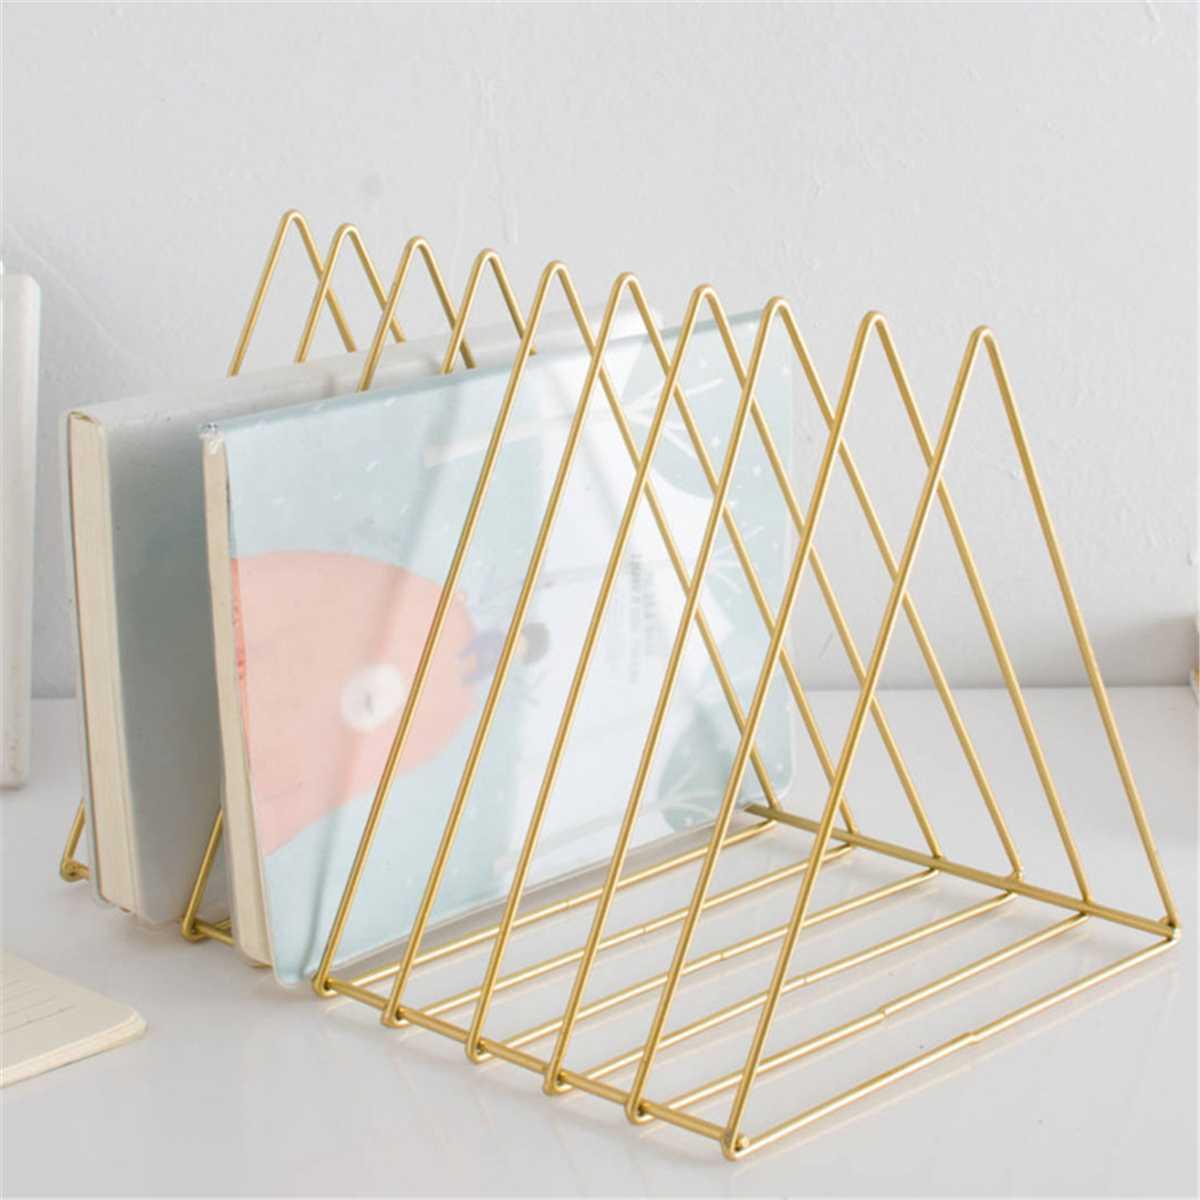 Metal Triangle Iron Art Desktop Bookshelf Letter Magazine Storage Rack Holder Home Decor